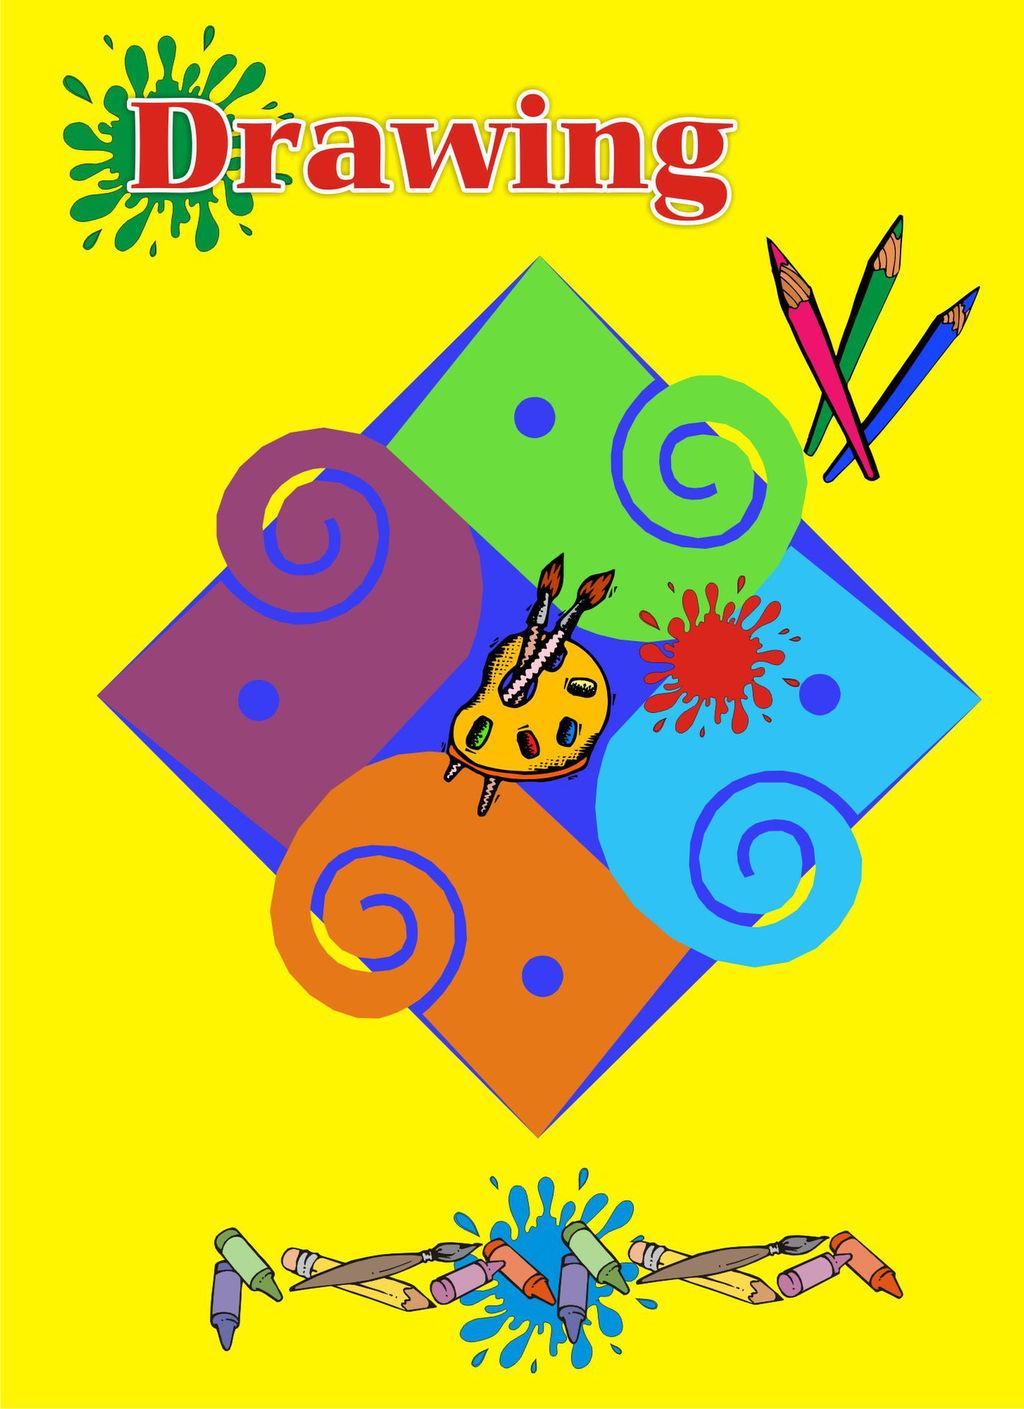 ketan chaudhary graphics designer  freelancer available